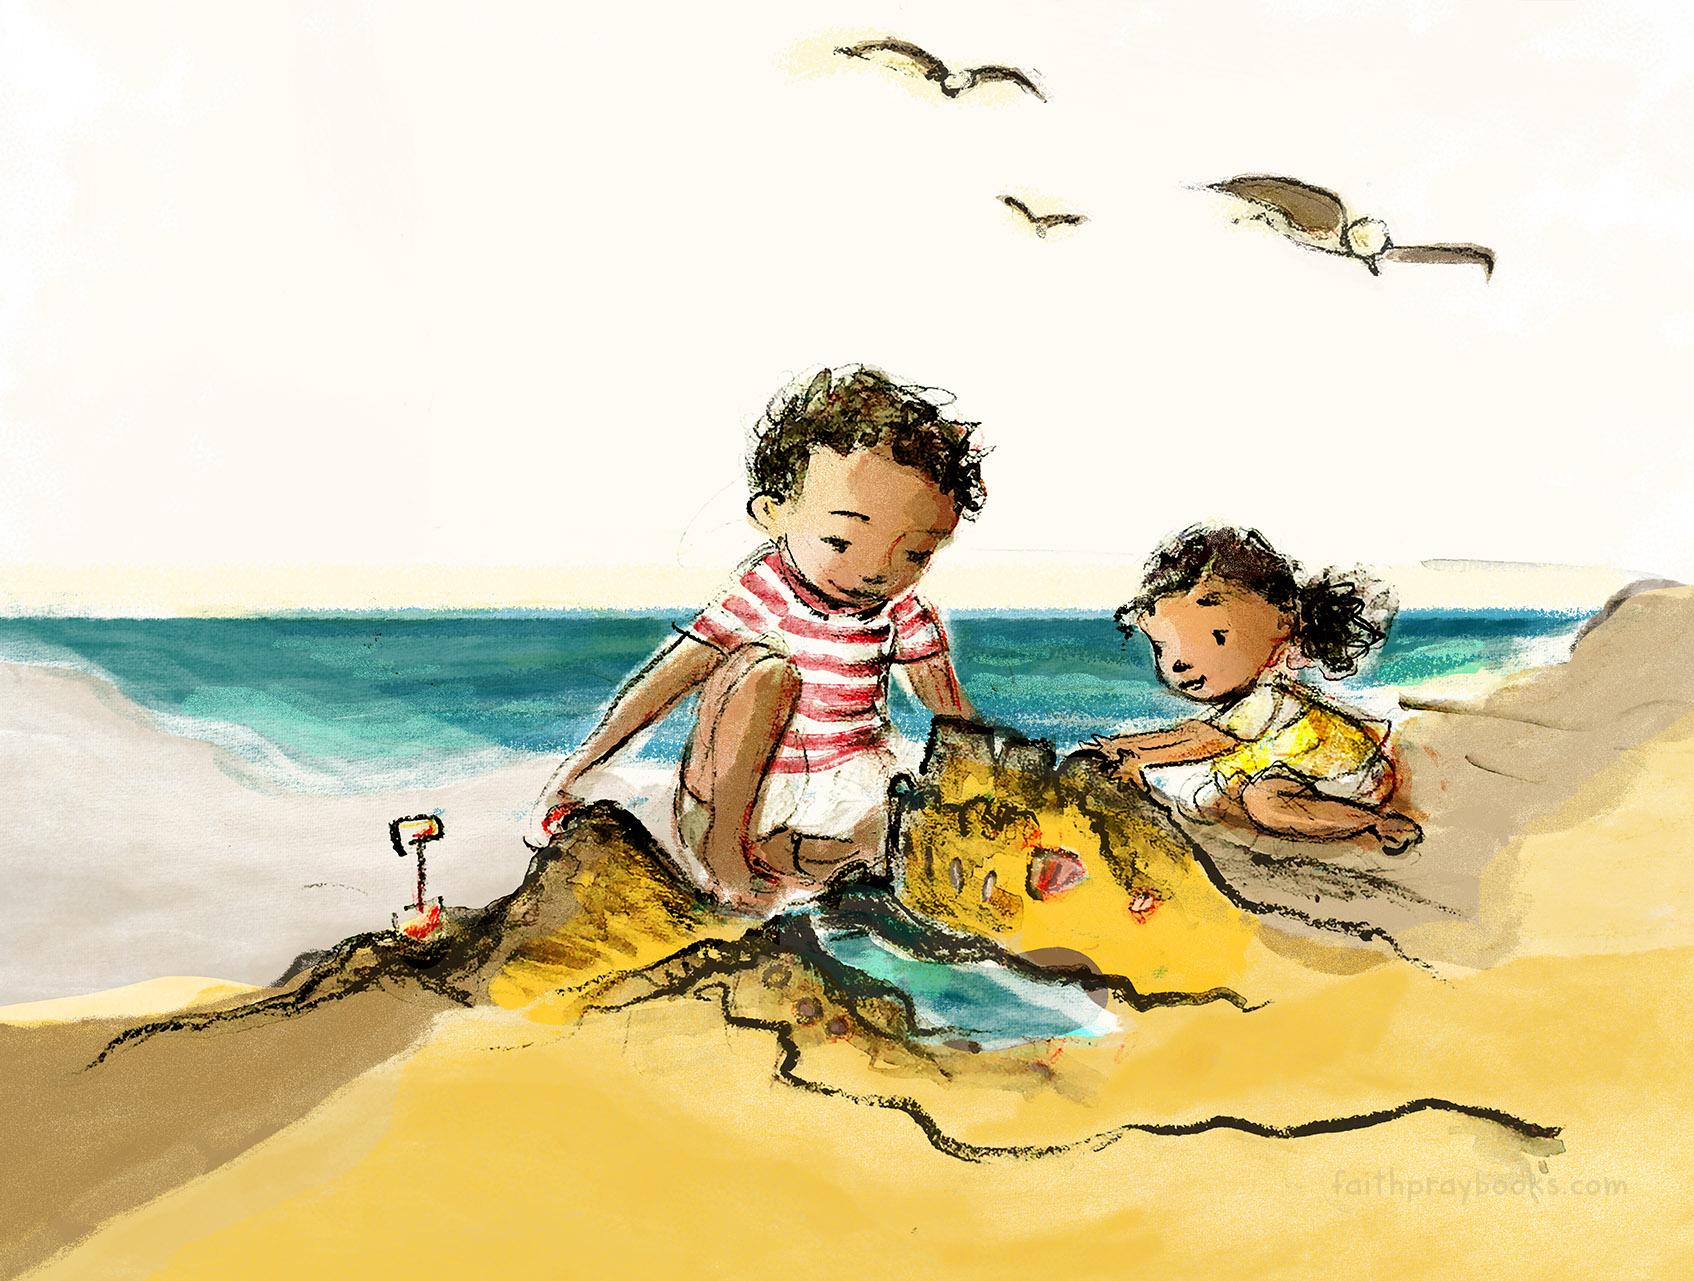 beachdayweb.jpg